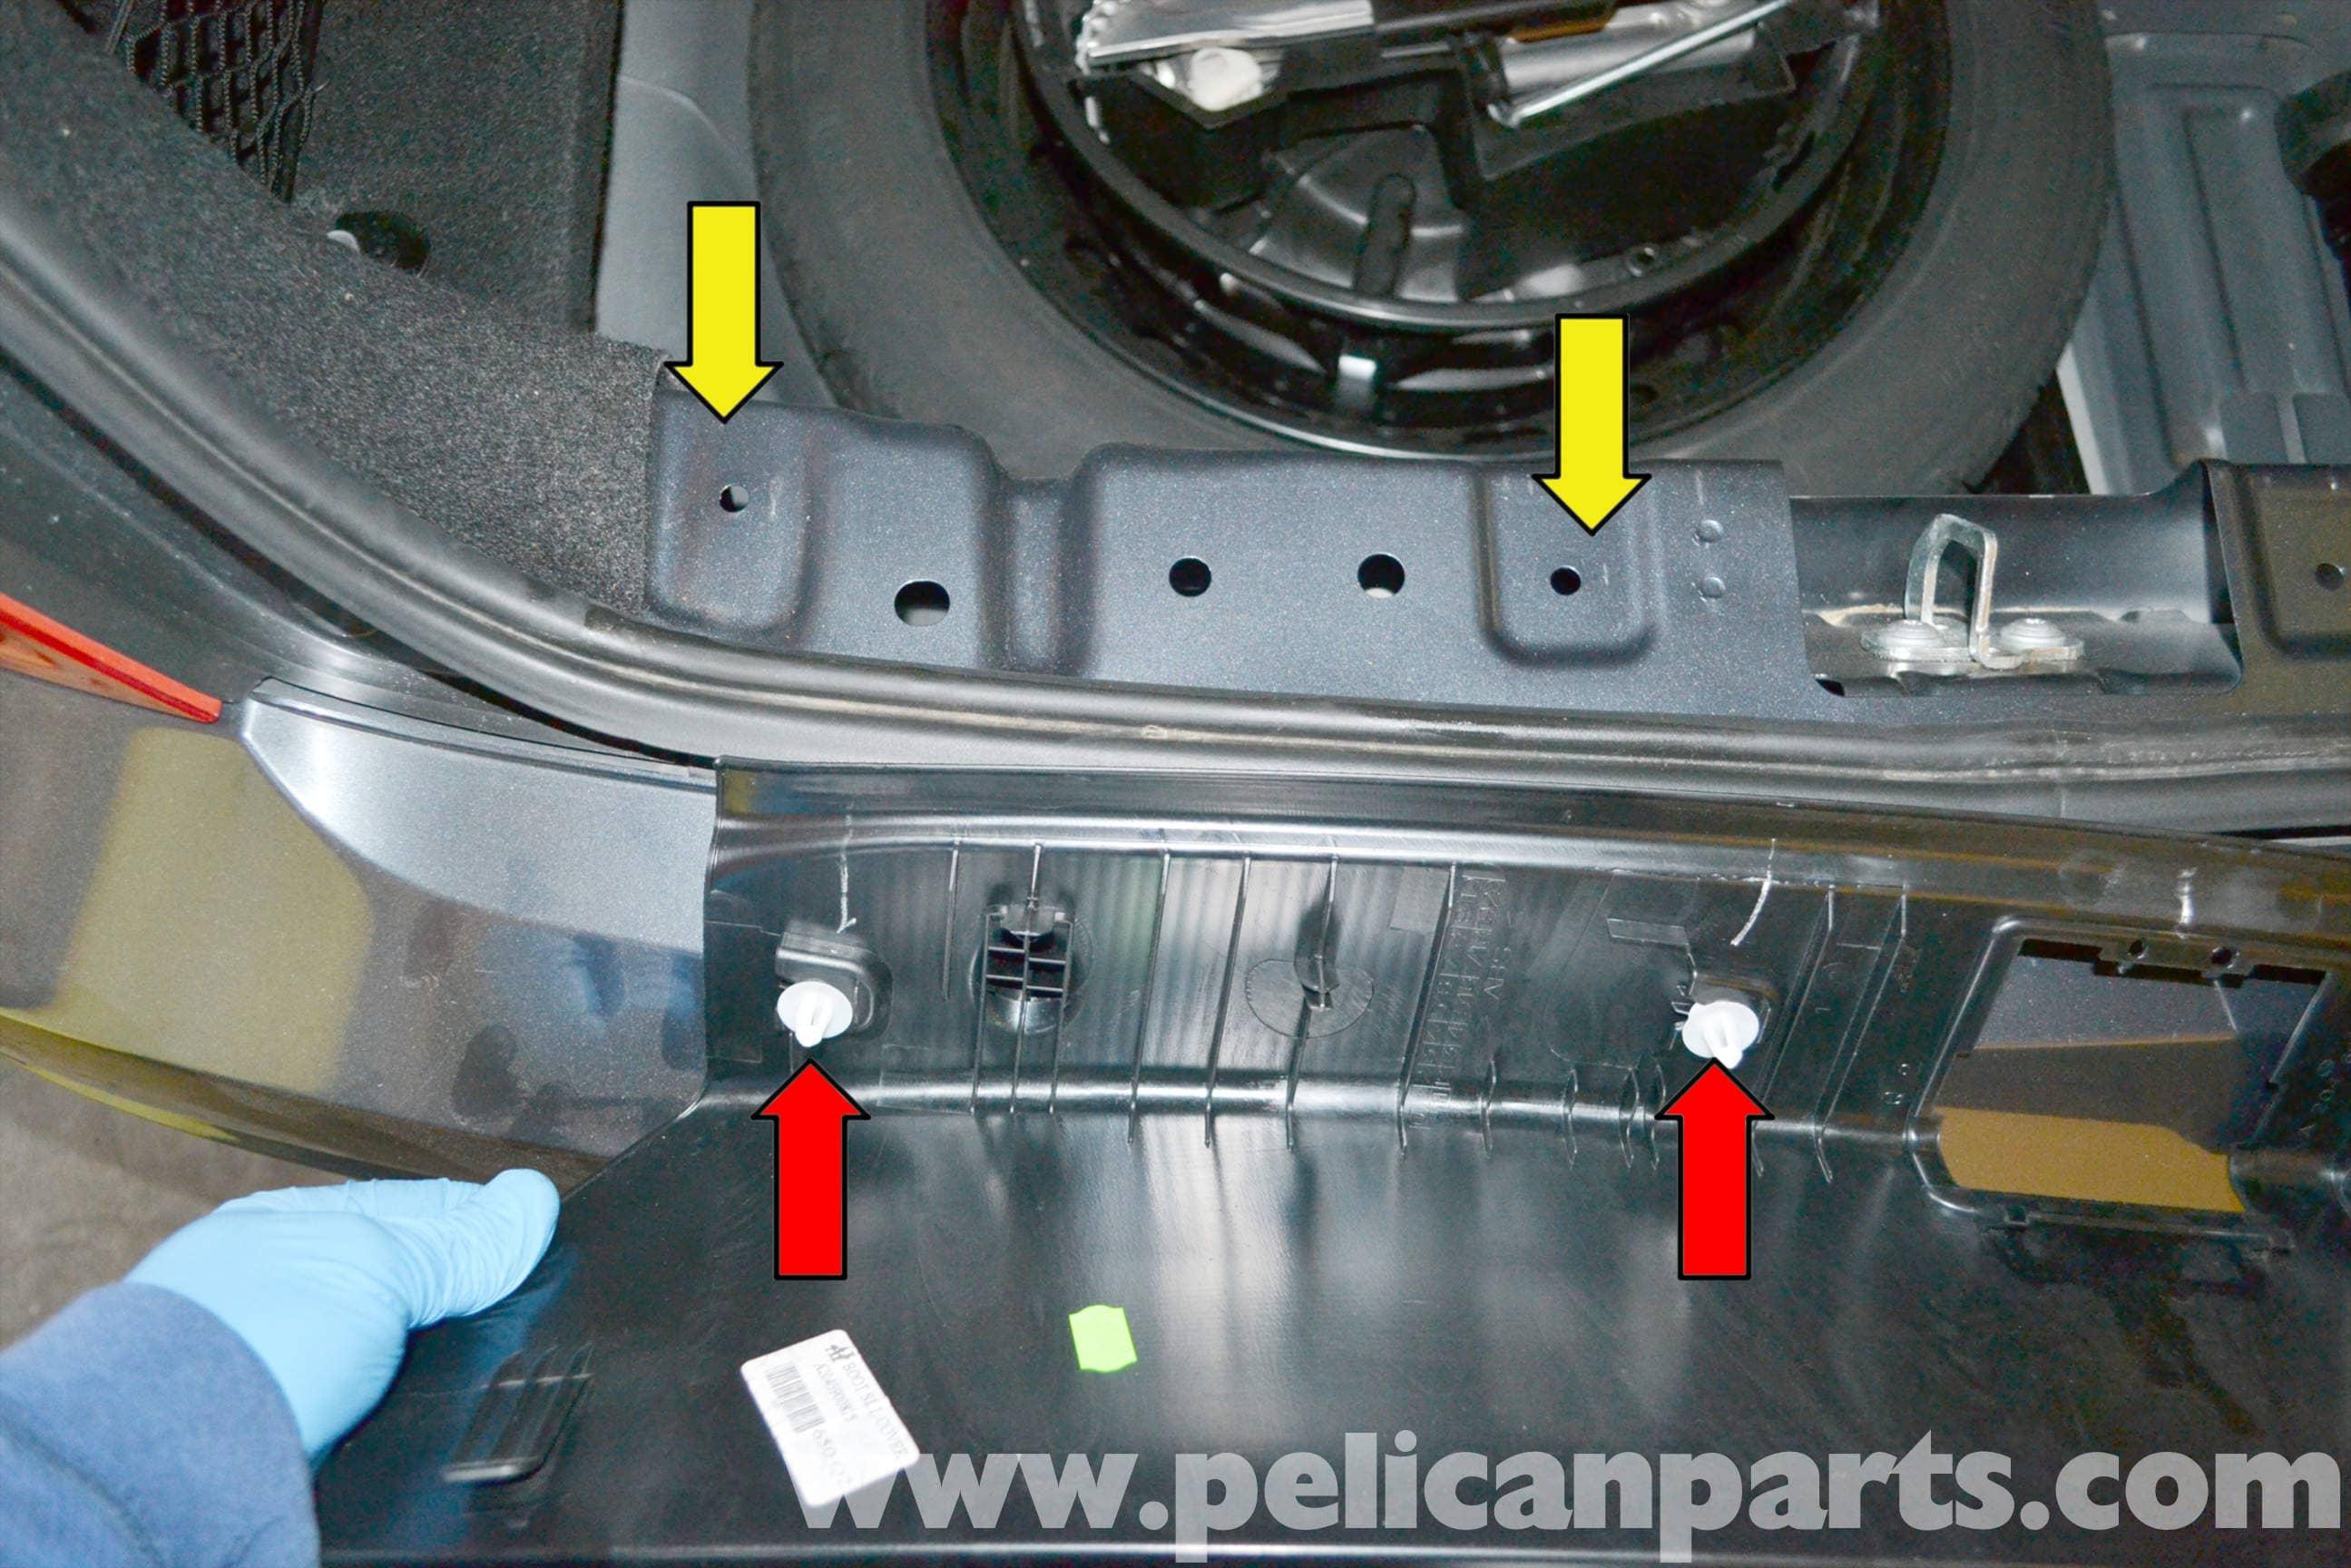 Mercedes Benz W204 Rear Bumper Cover Removal 2008 2014